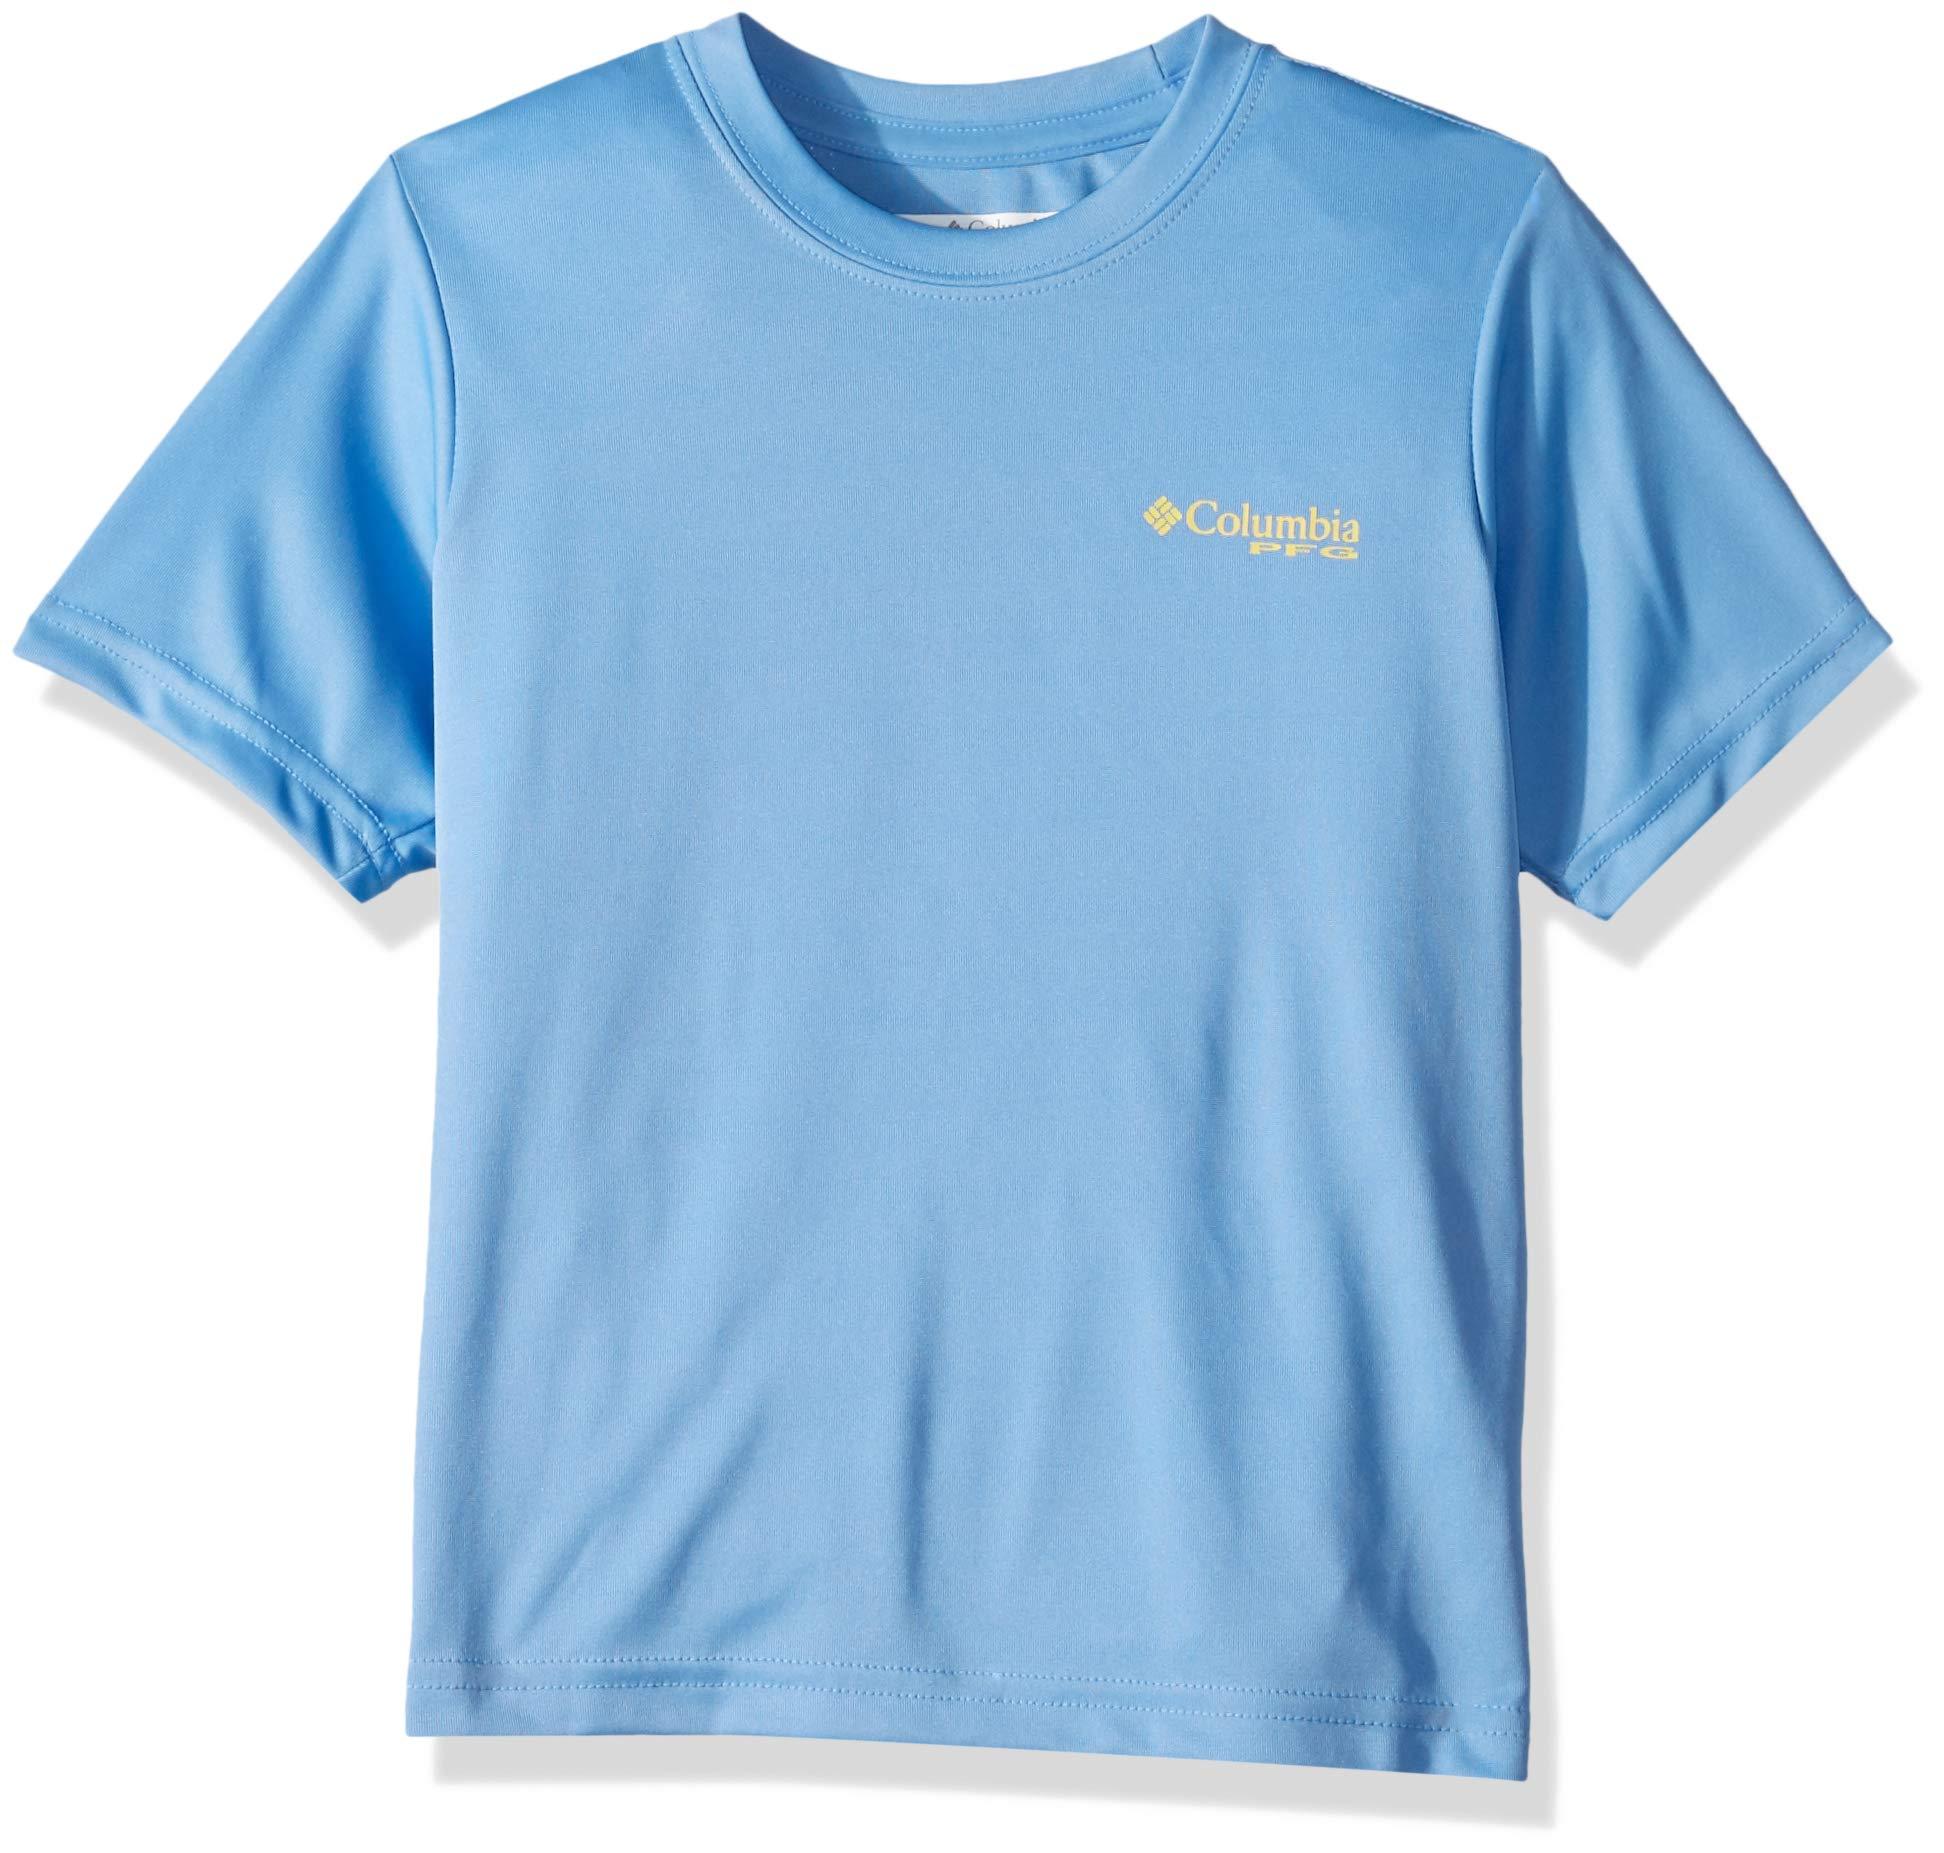 Columbia Boys PFGOffshore Short Sleeve Shirt, White Cap Graphic Compass, Small